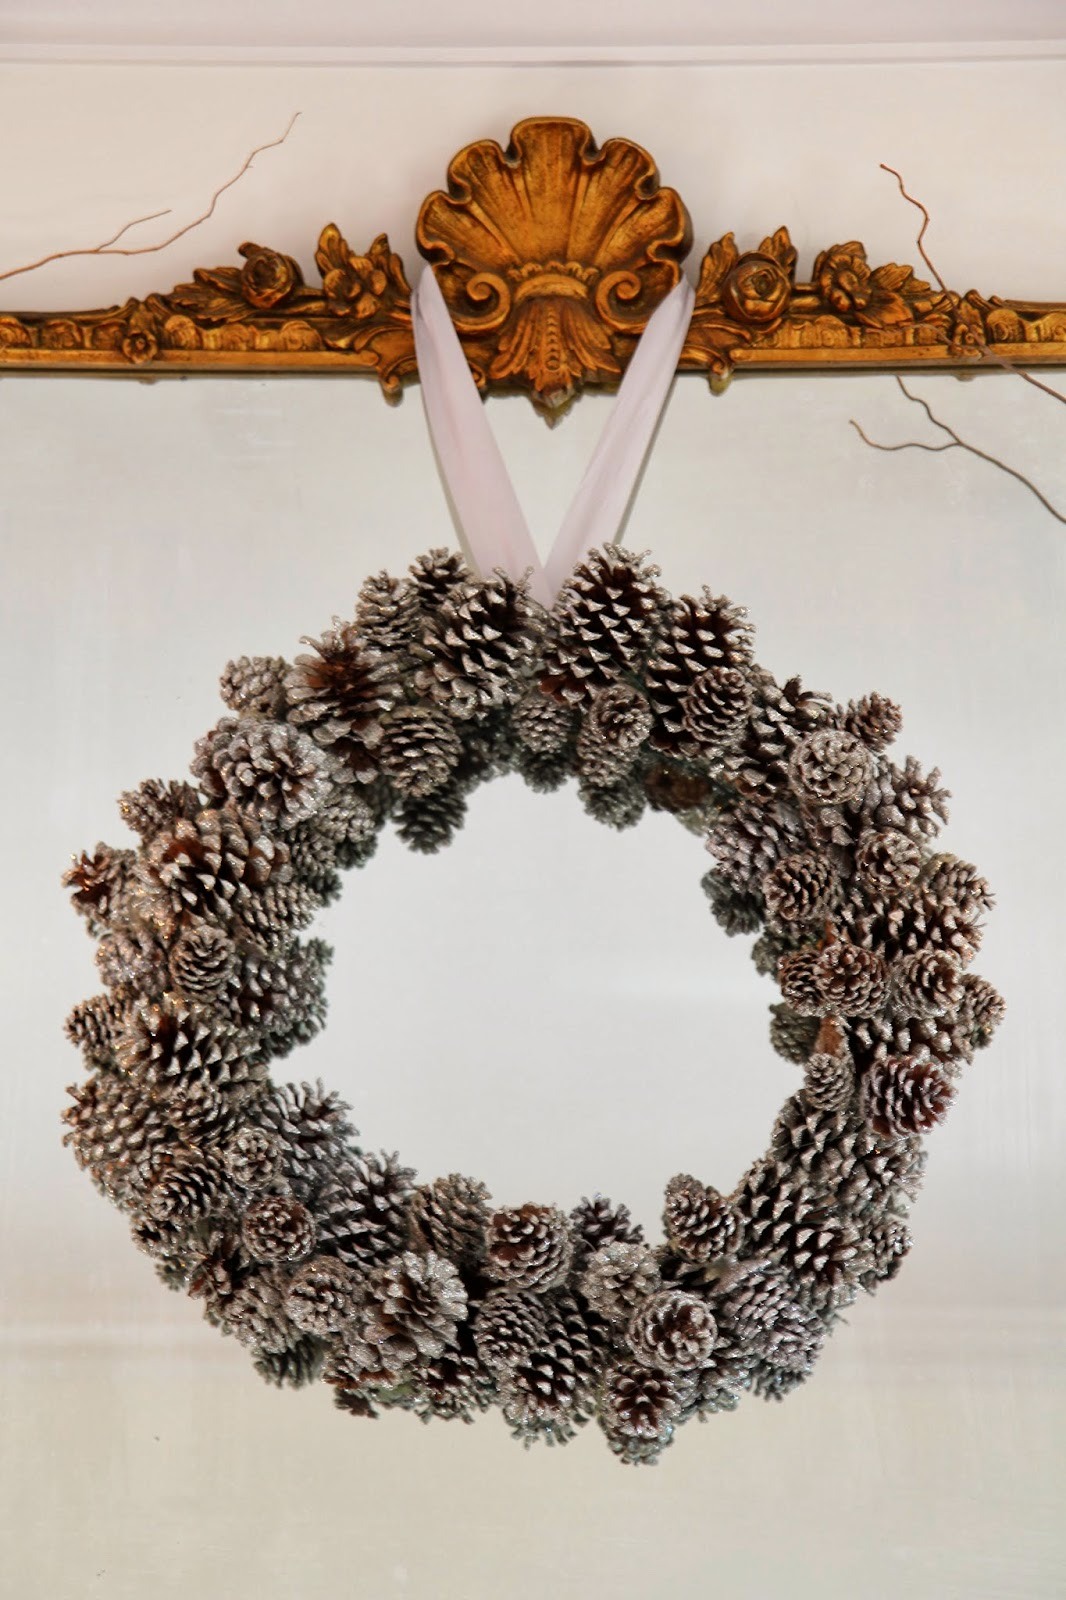 Glittered Pinecone Wreath